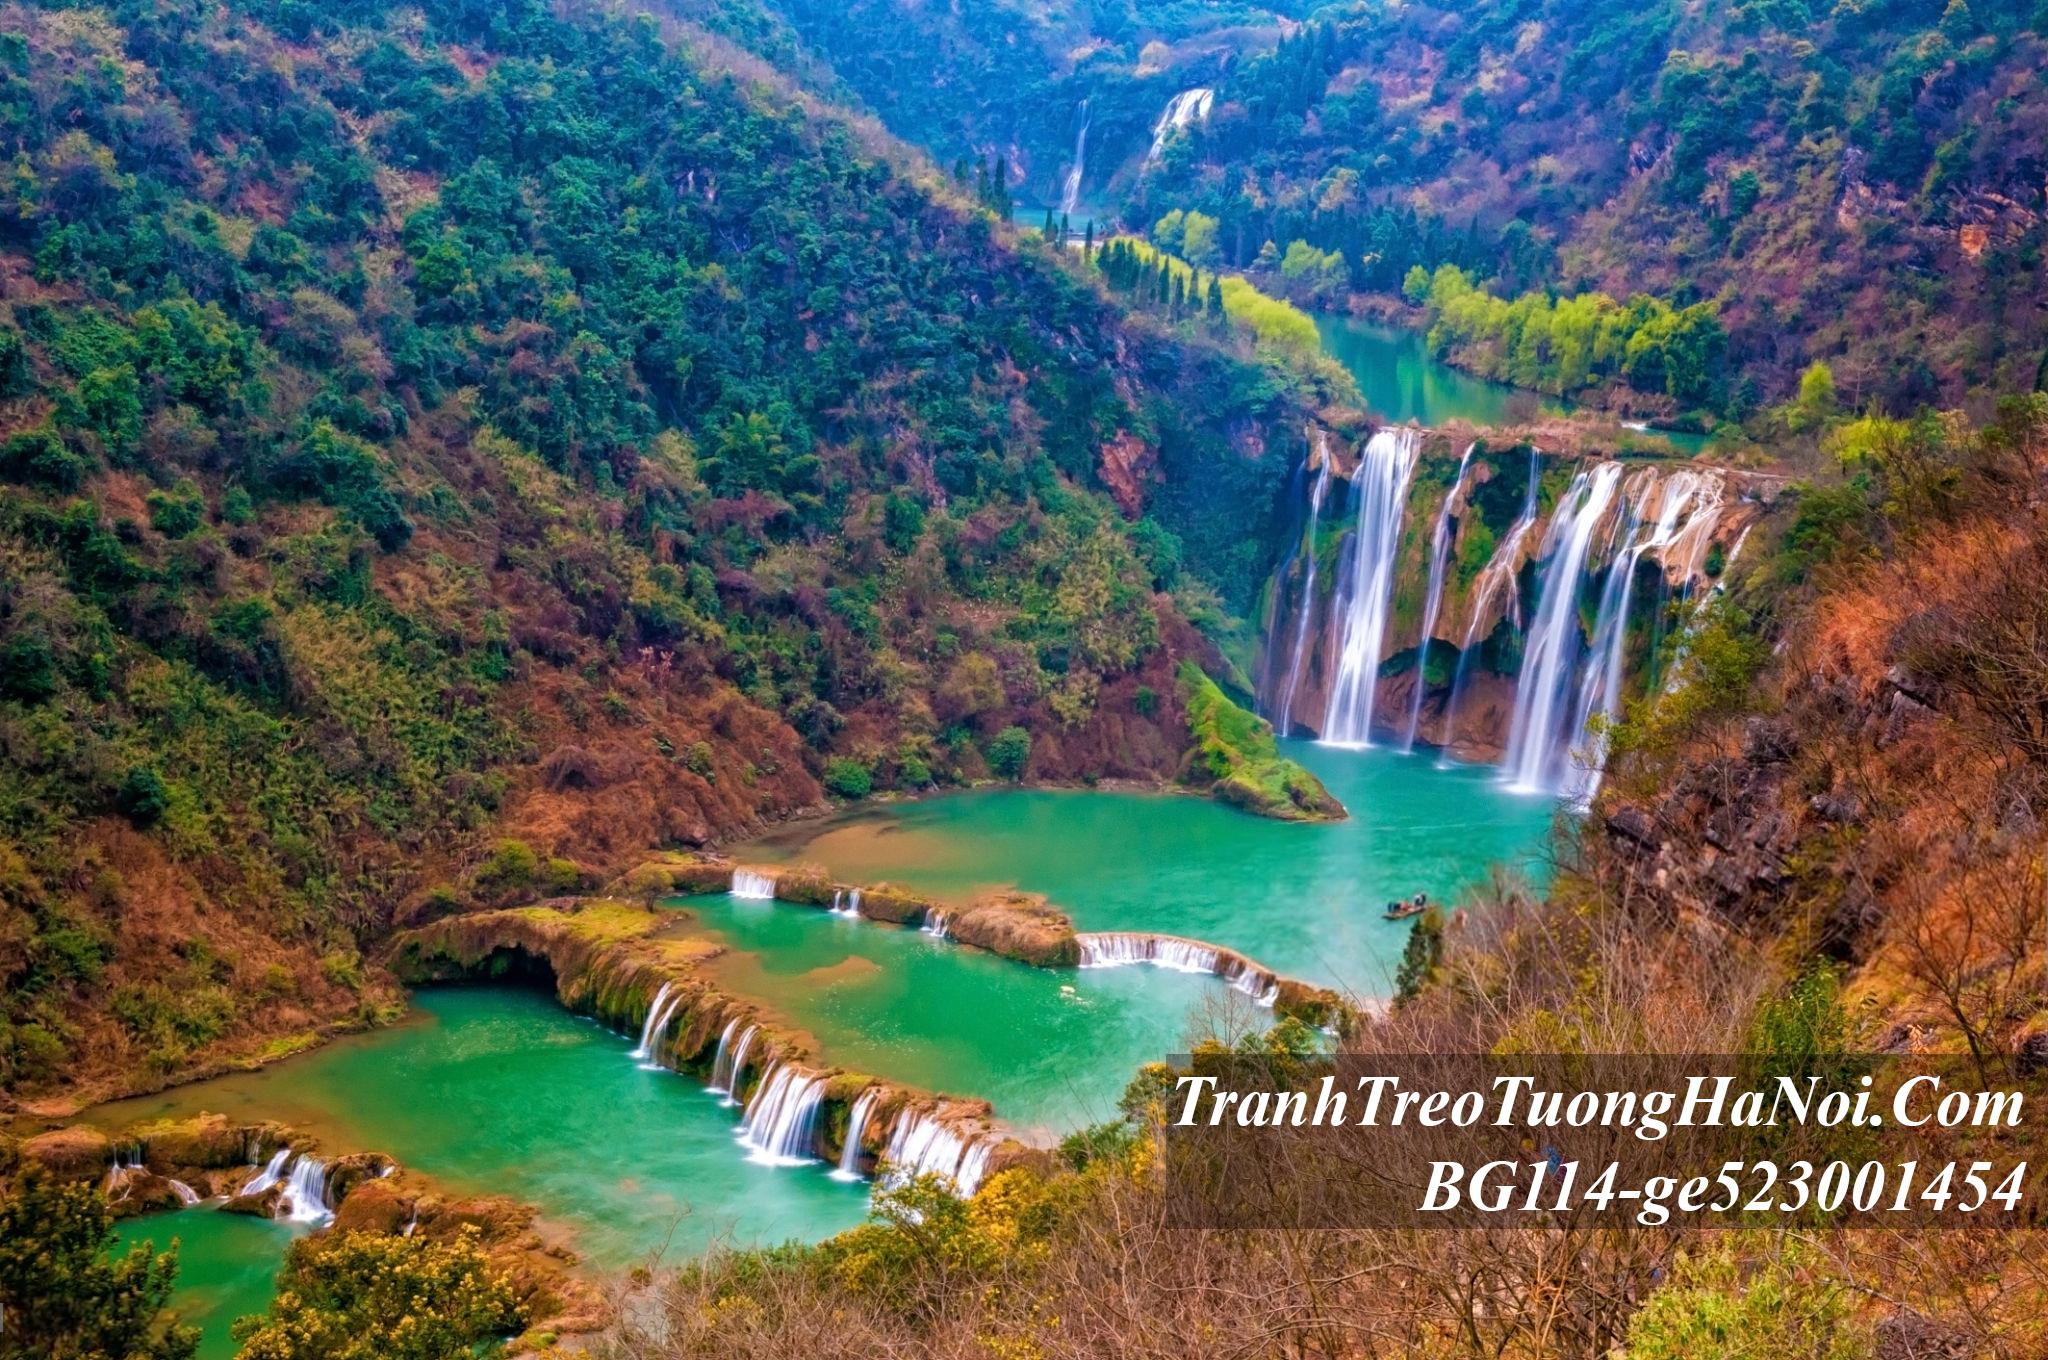 Tranh phong canh thac nuoc ban gioc BG114-ge523001454